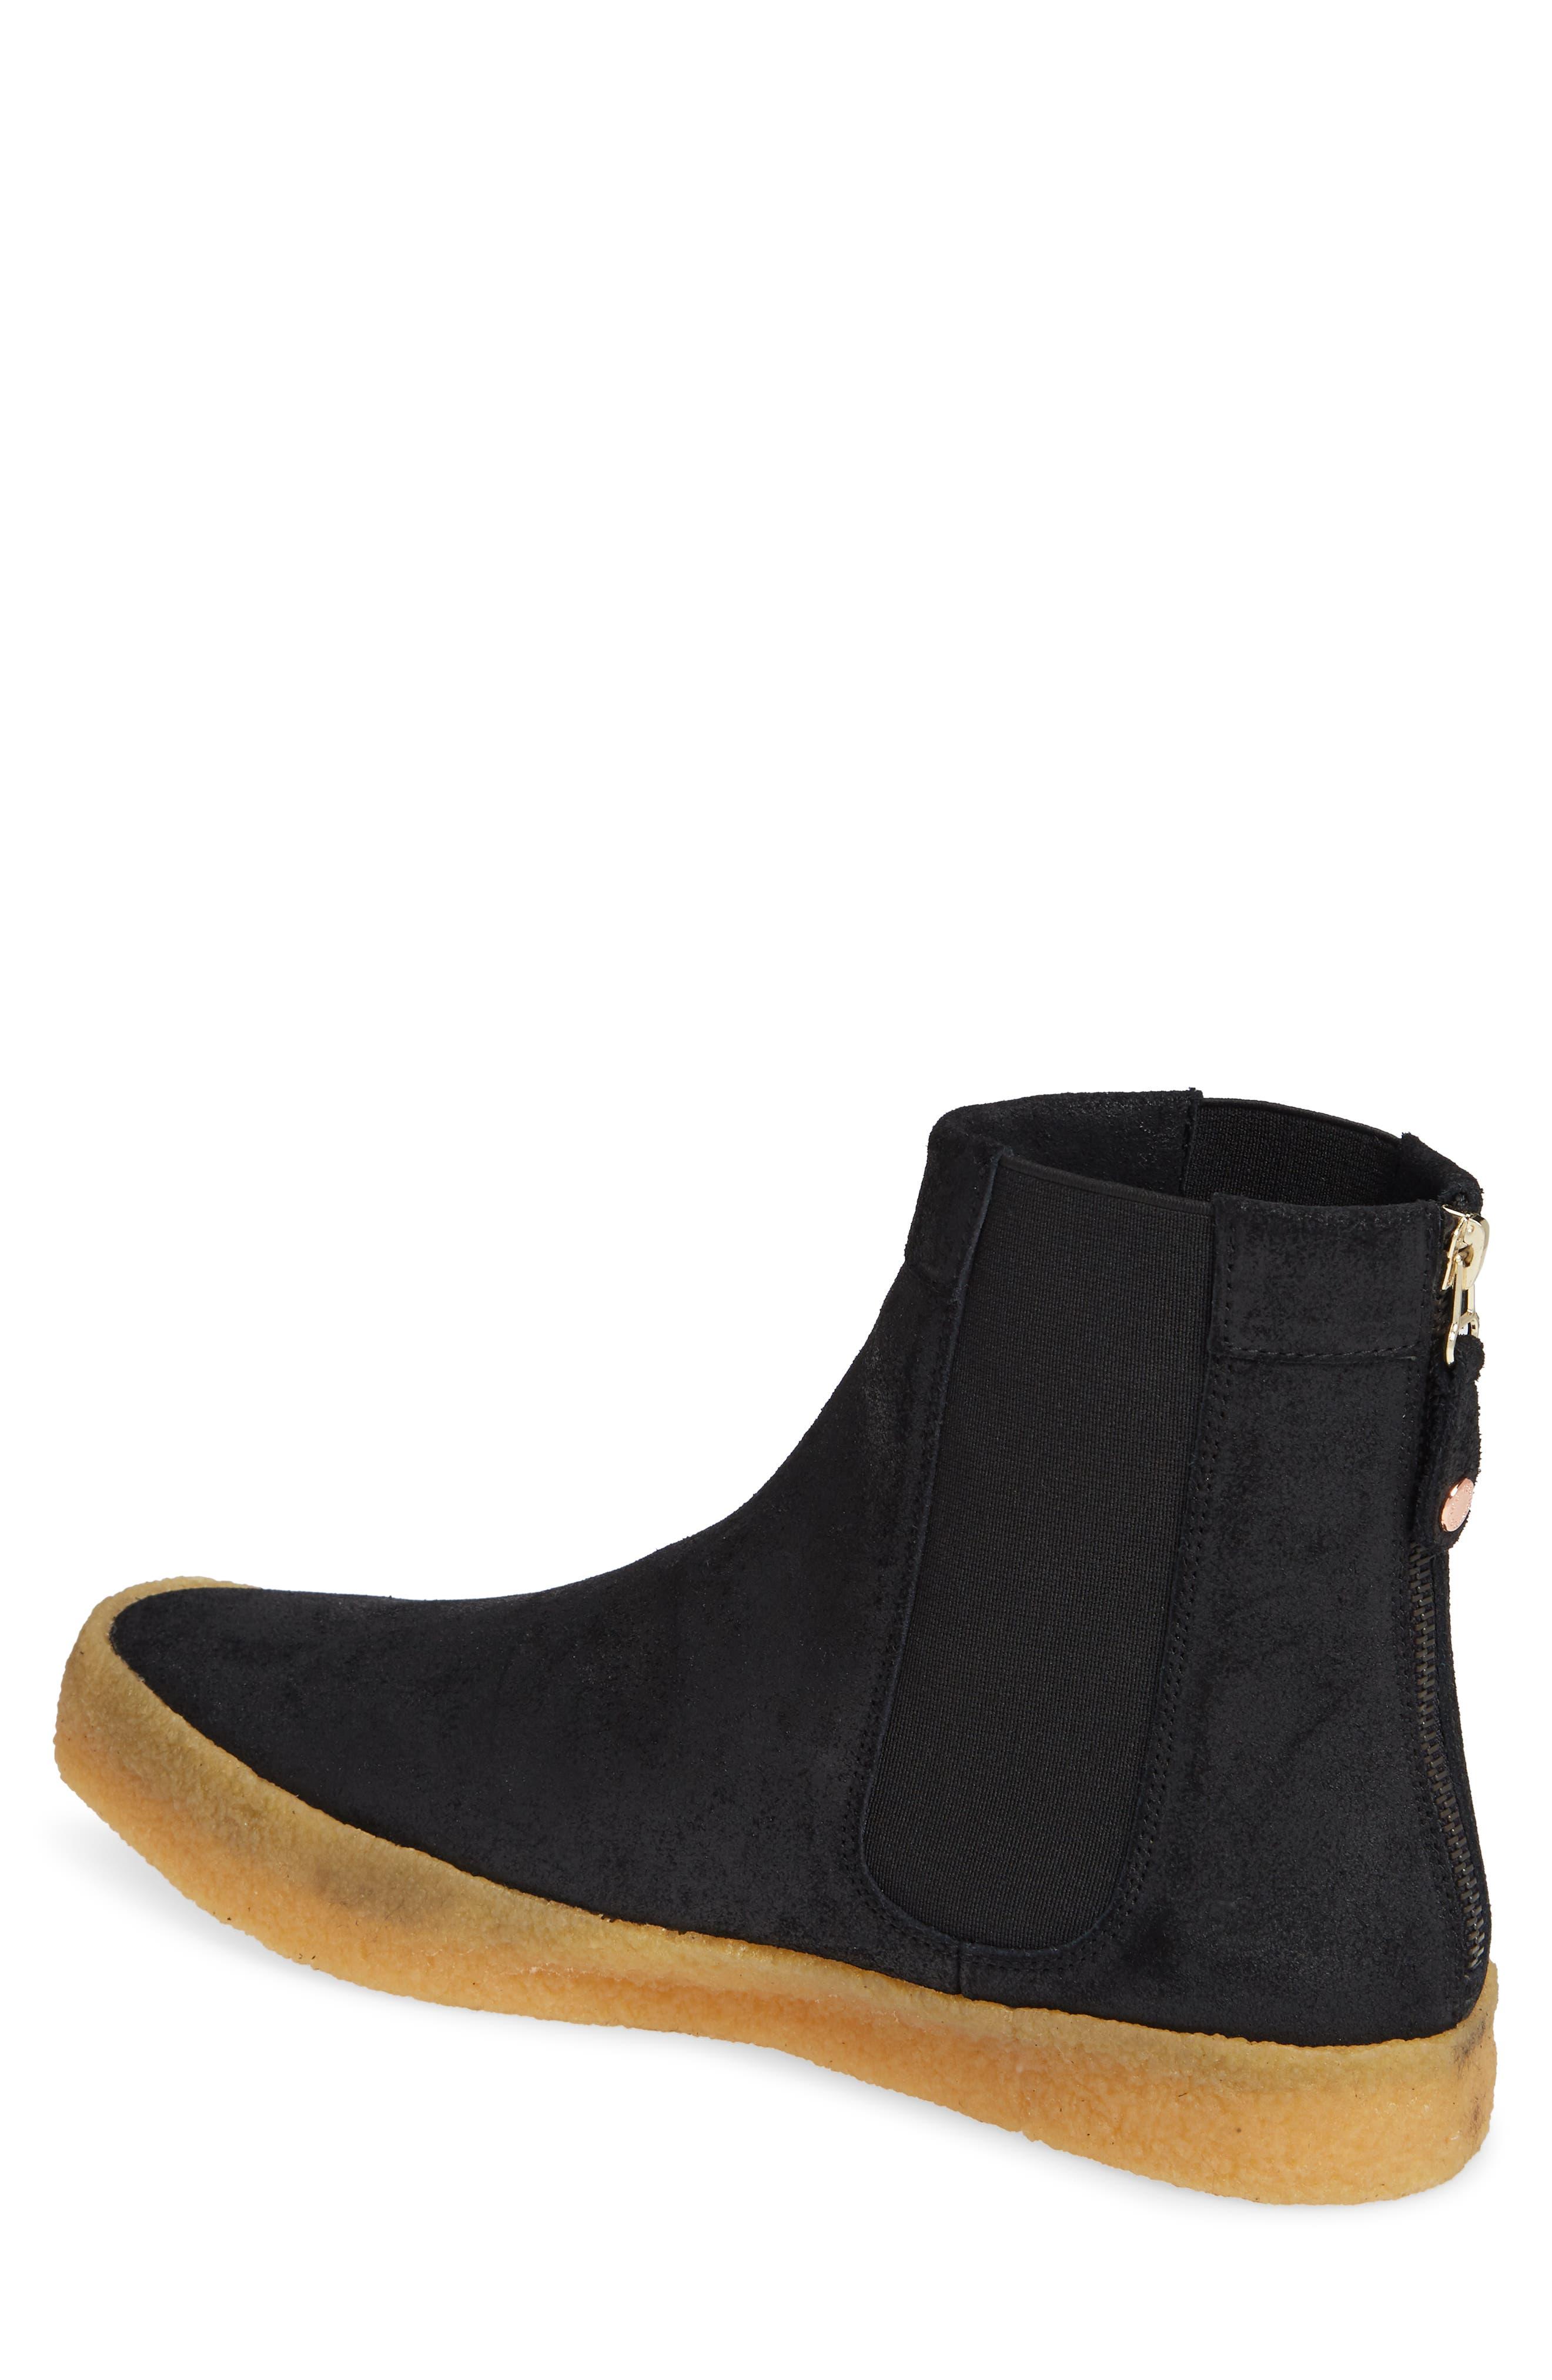 Sin Chelsea Boot,                             Main thumbnail 1, color,                             BLACK GUM SUEDE/ NYLON